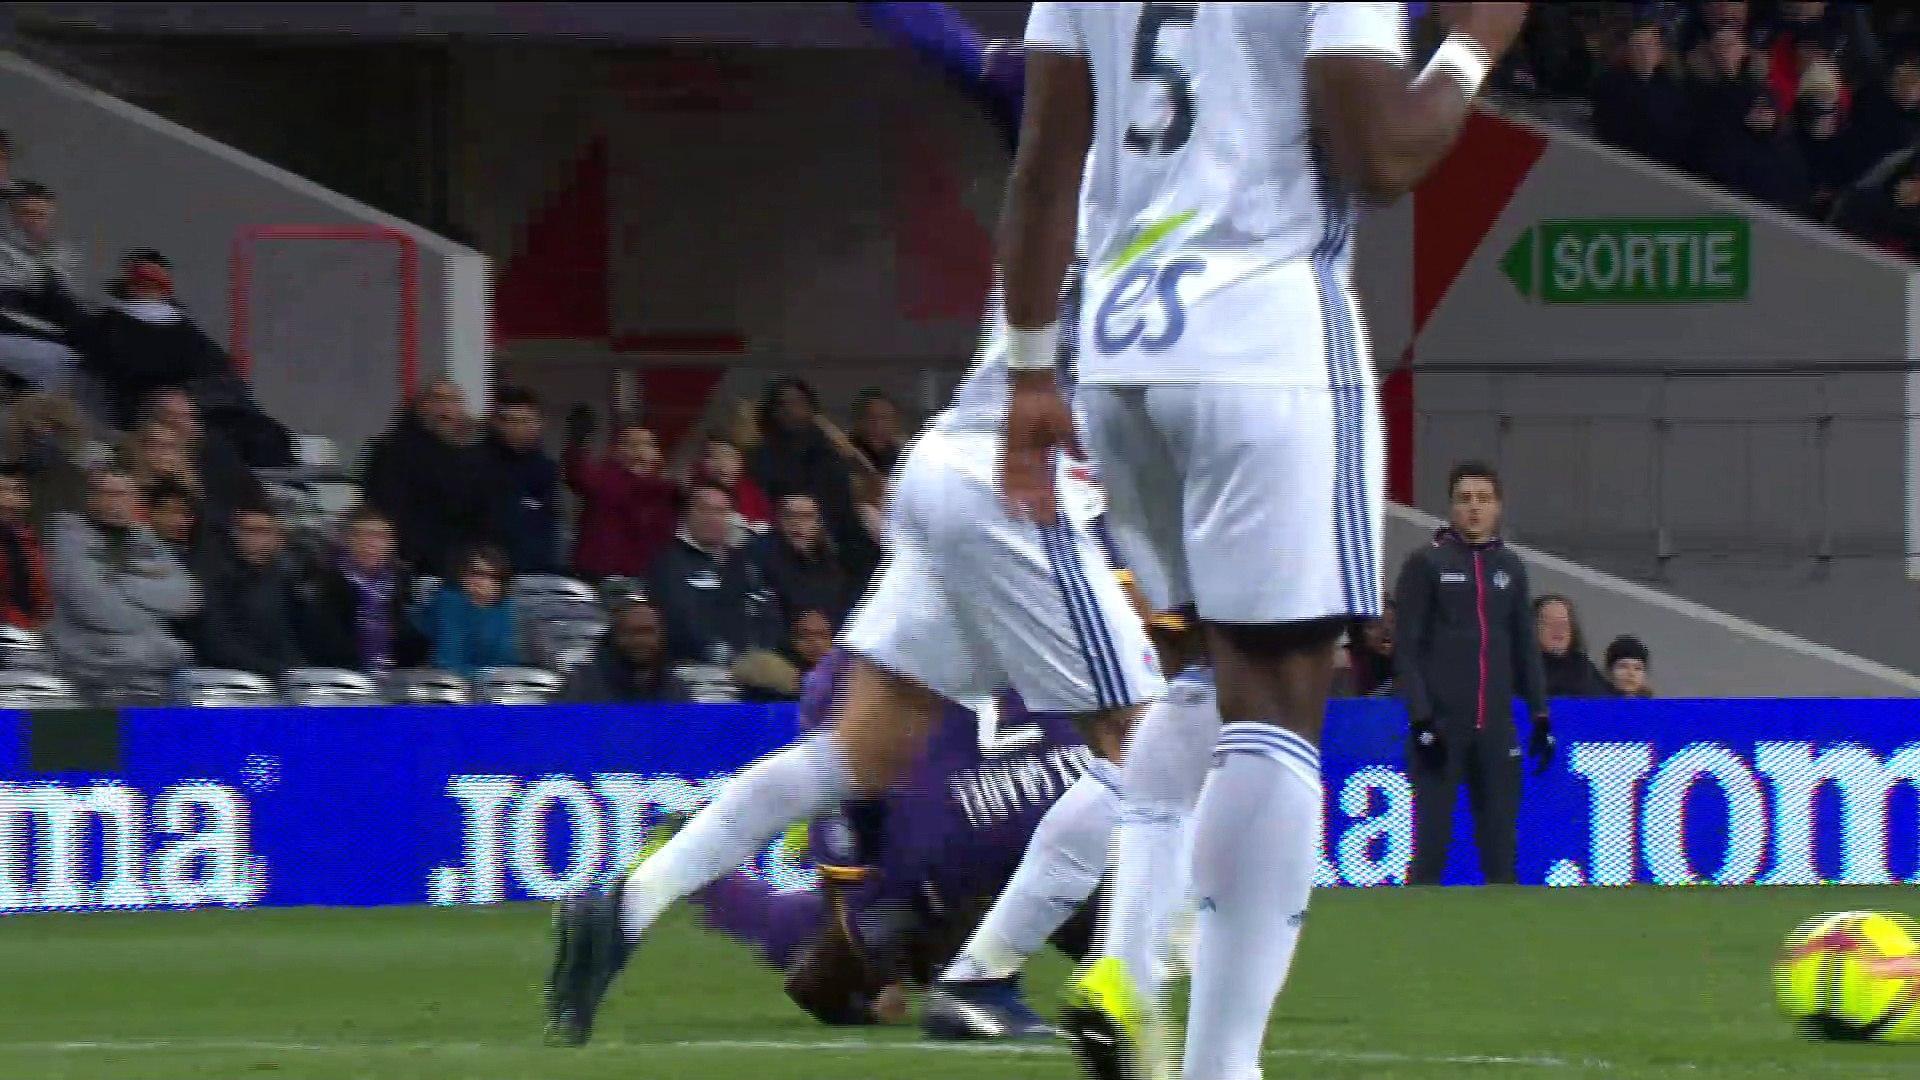 L'égalisation de Yaya Sanogo sur pénalty contre Strasbourg !